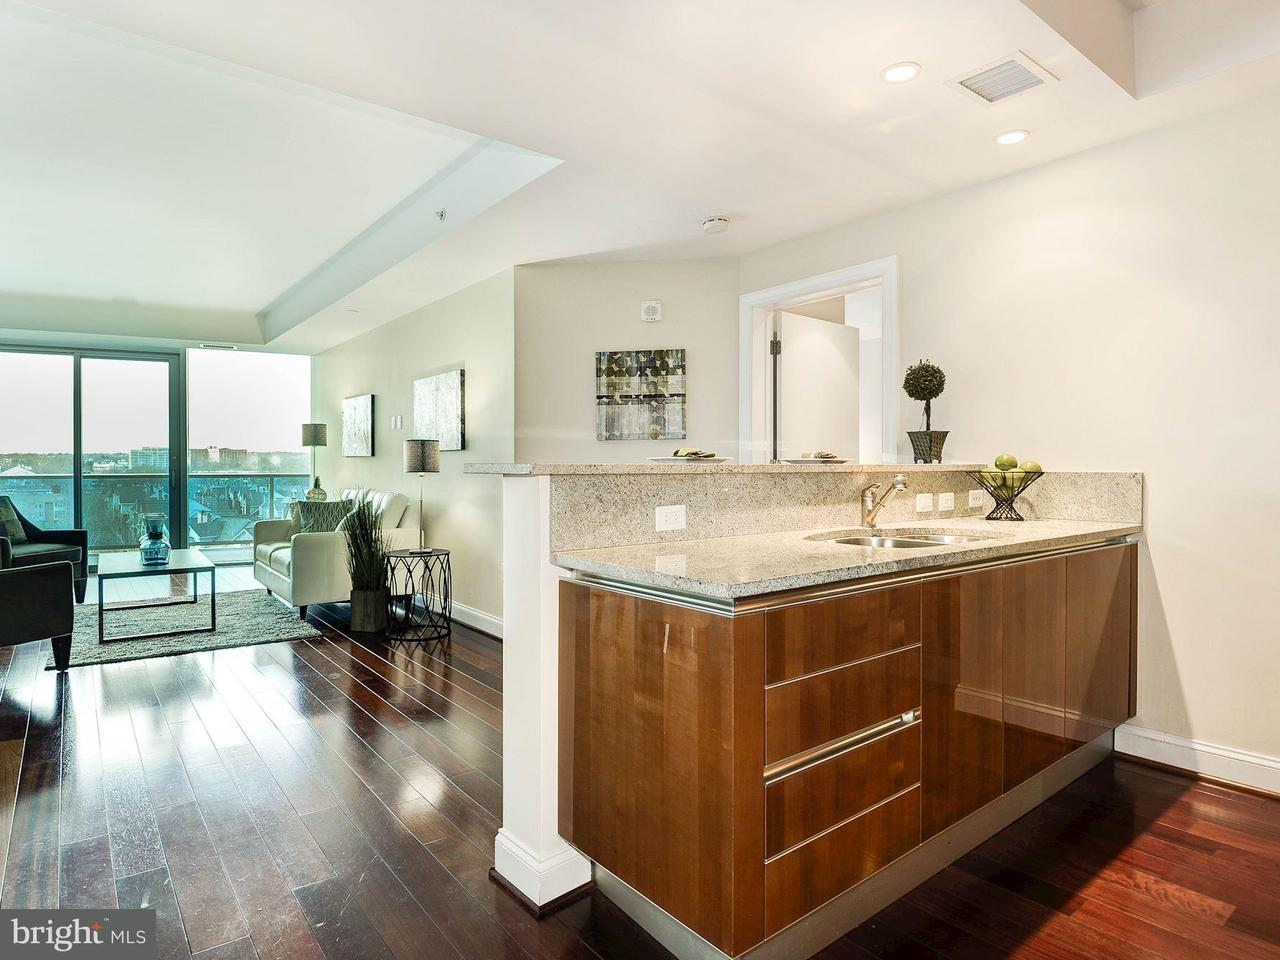 Condominium for Sale at 1881 Nash St #1208 1881 Nash St #1208 Arlington, Virginia 22209 United States